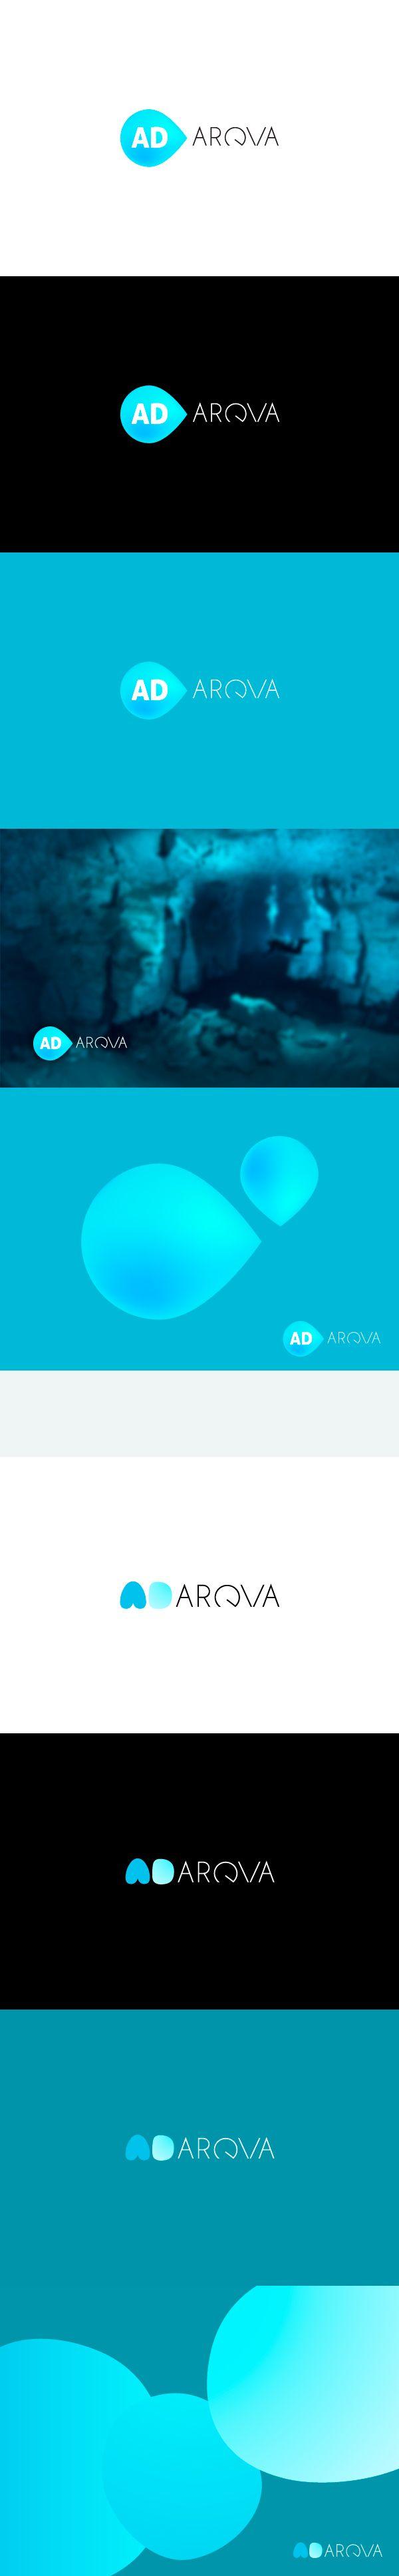 AdArqua on Behance